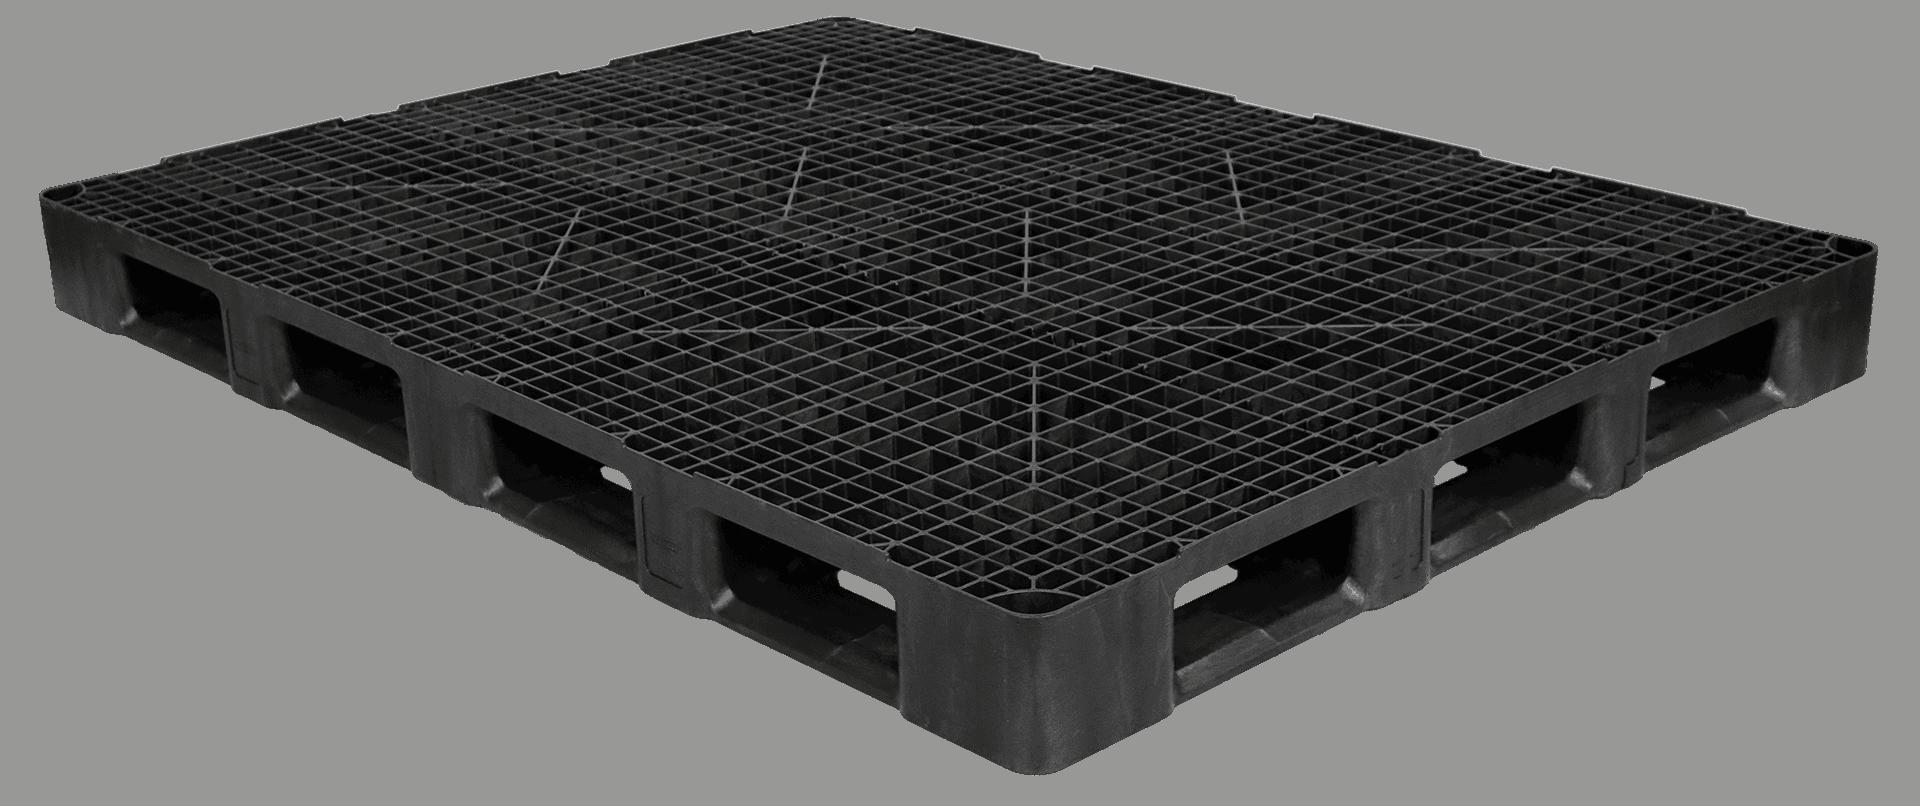 80x60 Stackable Pallet